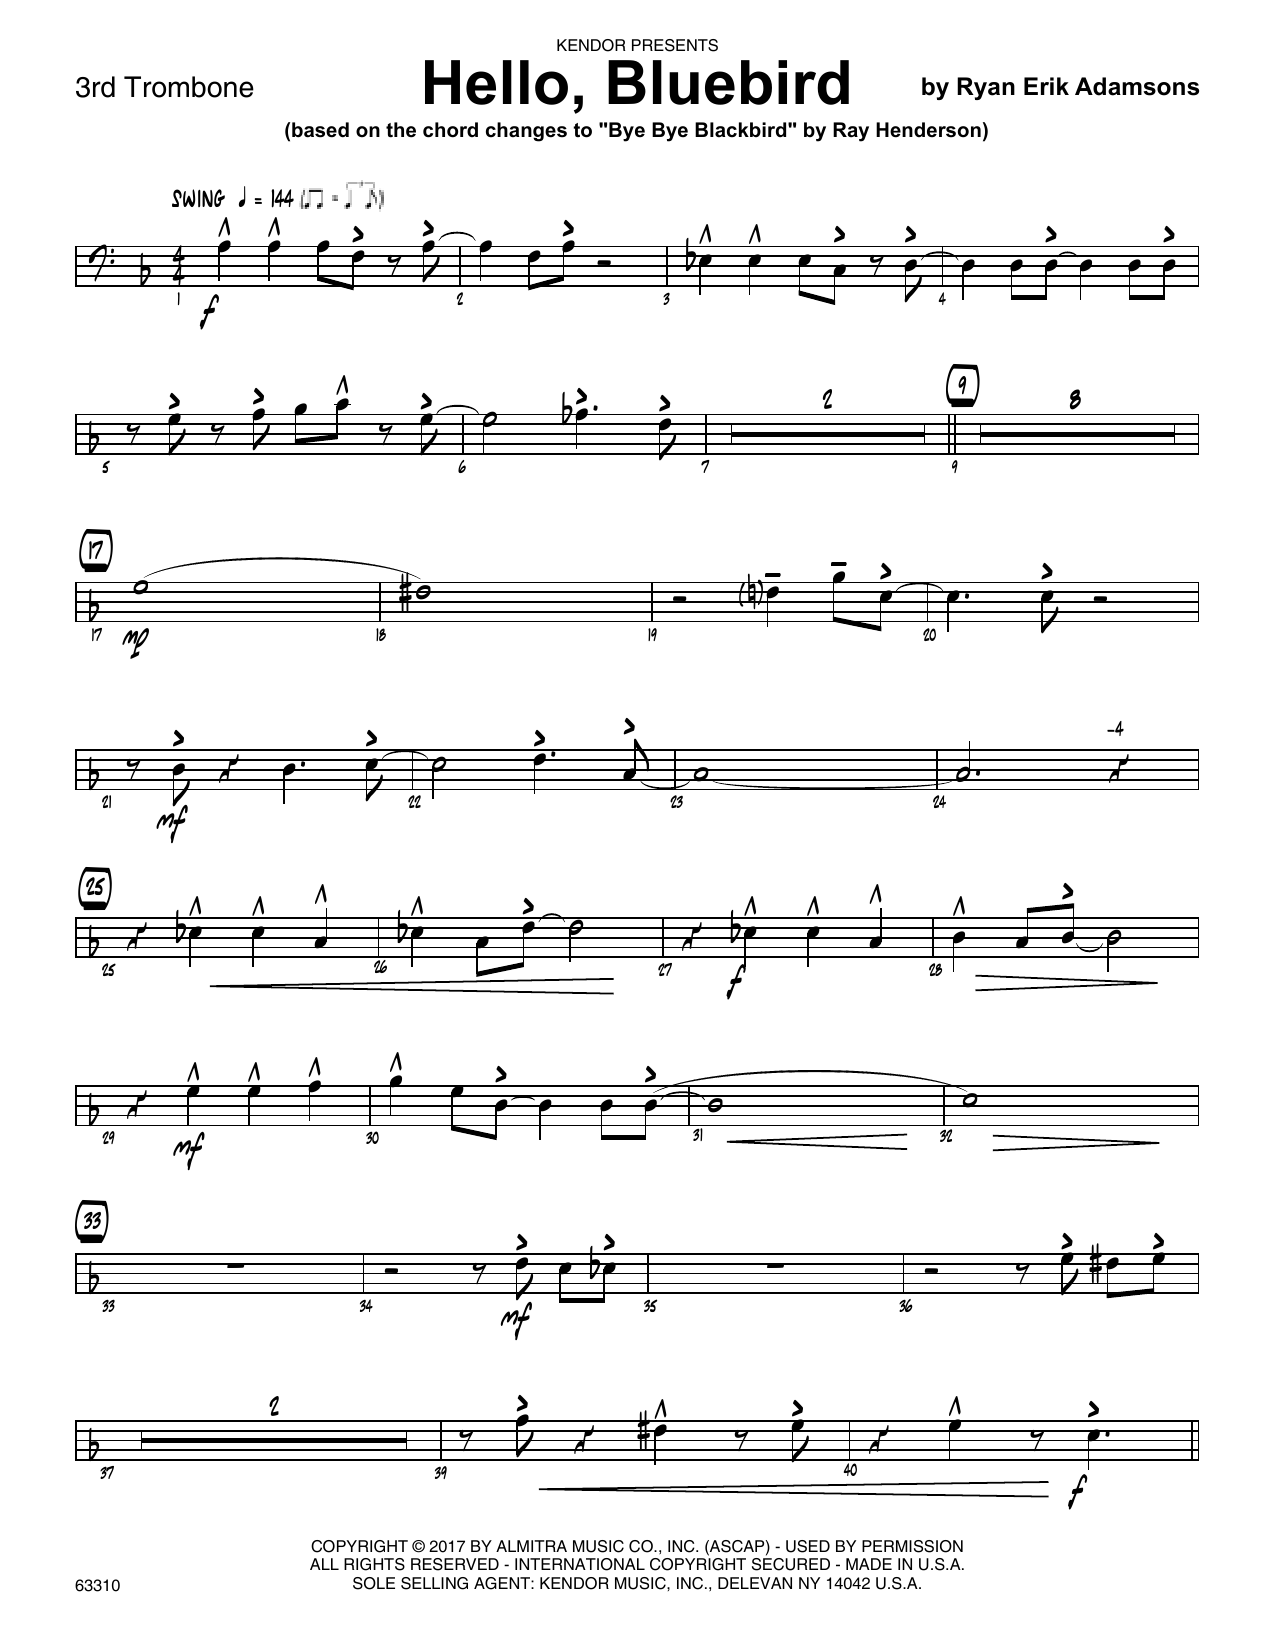 Ryan Erik Adamsons Hello, Bluebird (based on Bye Bye Blackbird) - 3rd Trombone sheet music notes printable PDF score